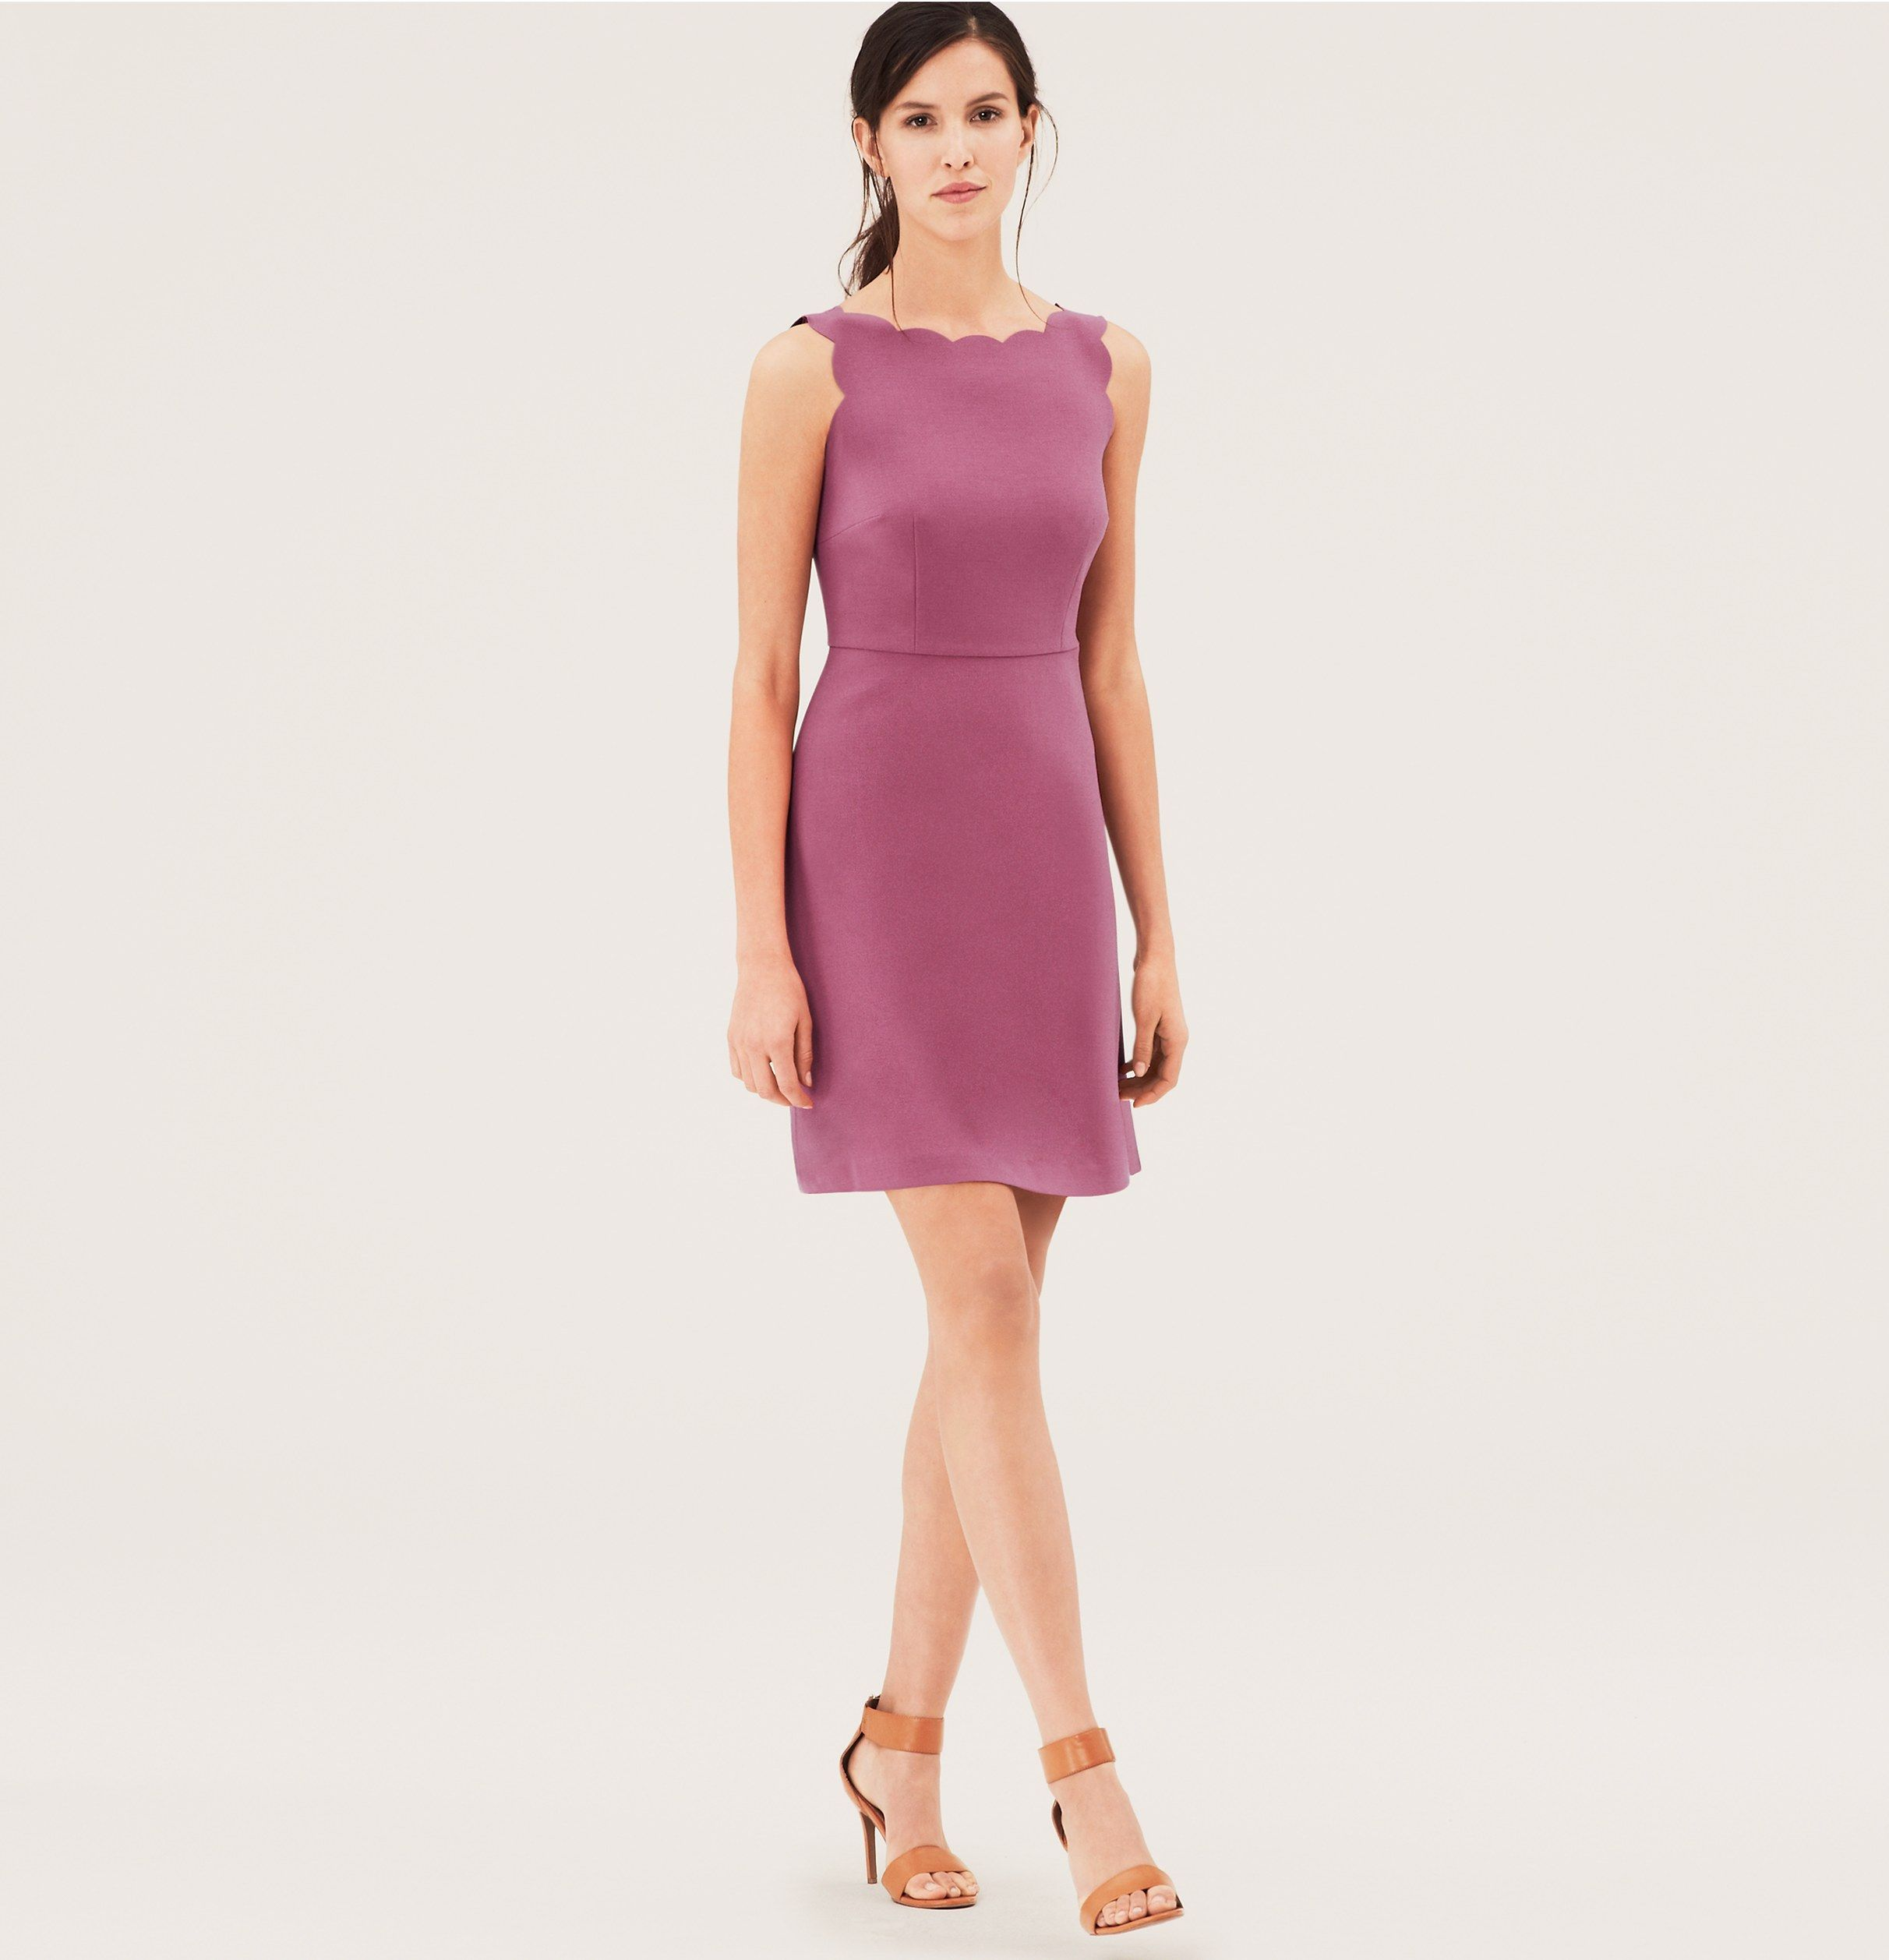 Scallop Bodice Dress | Loft | Dresses | Pinterest | Bodice, Rebel ...